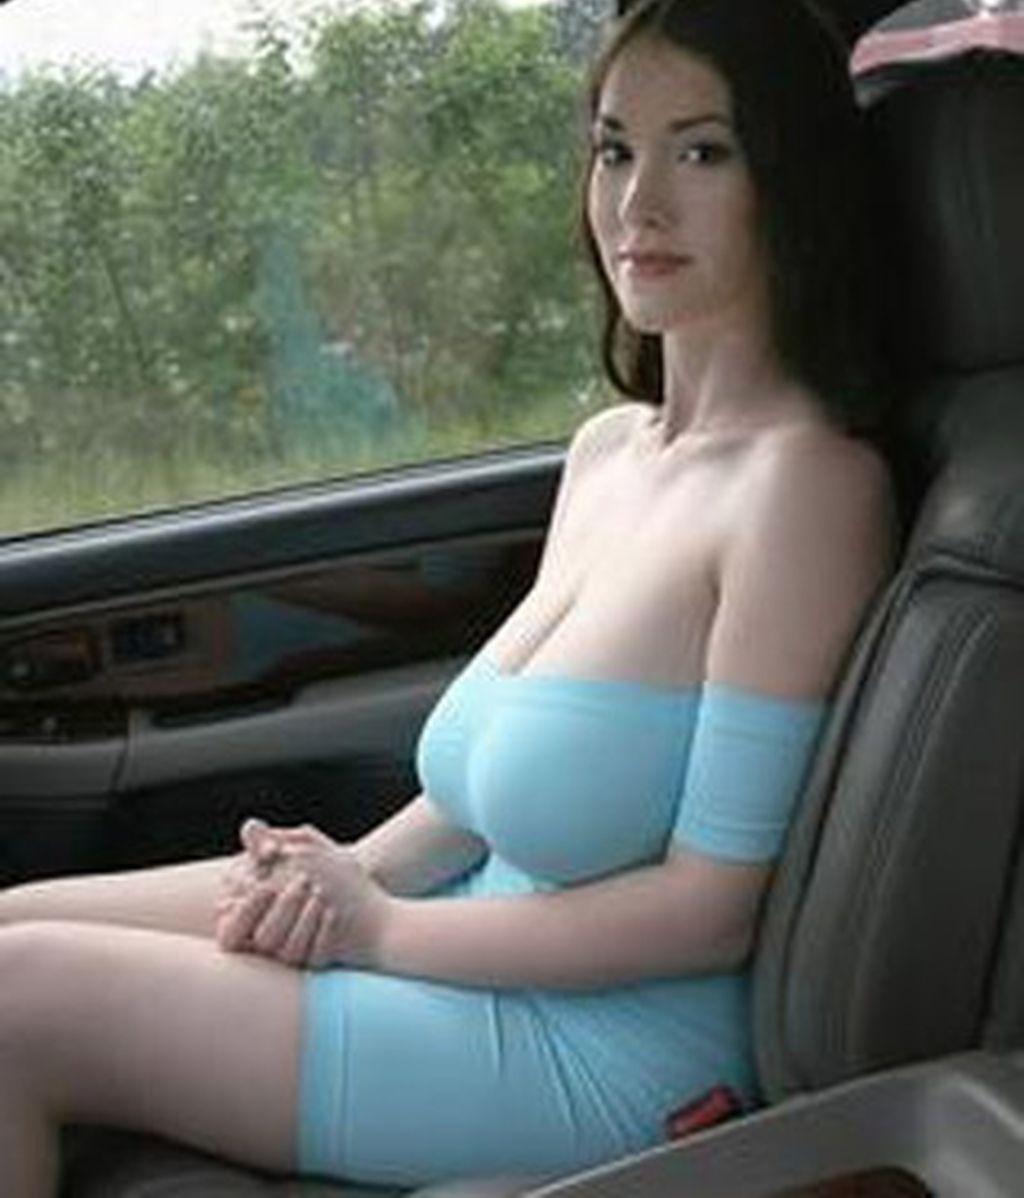 Una atrevida autoestopista. Foto: ThePsichologyToday.com